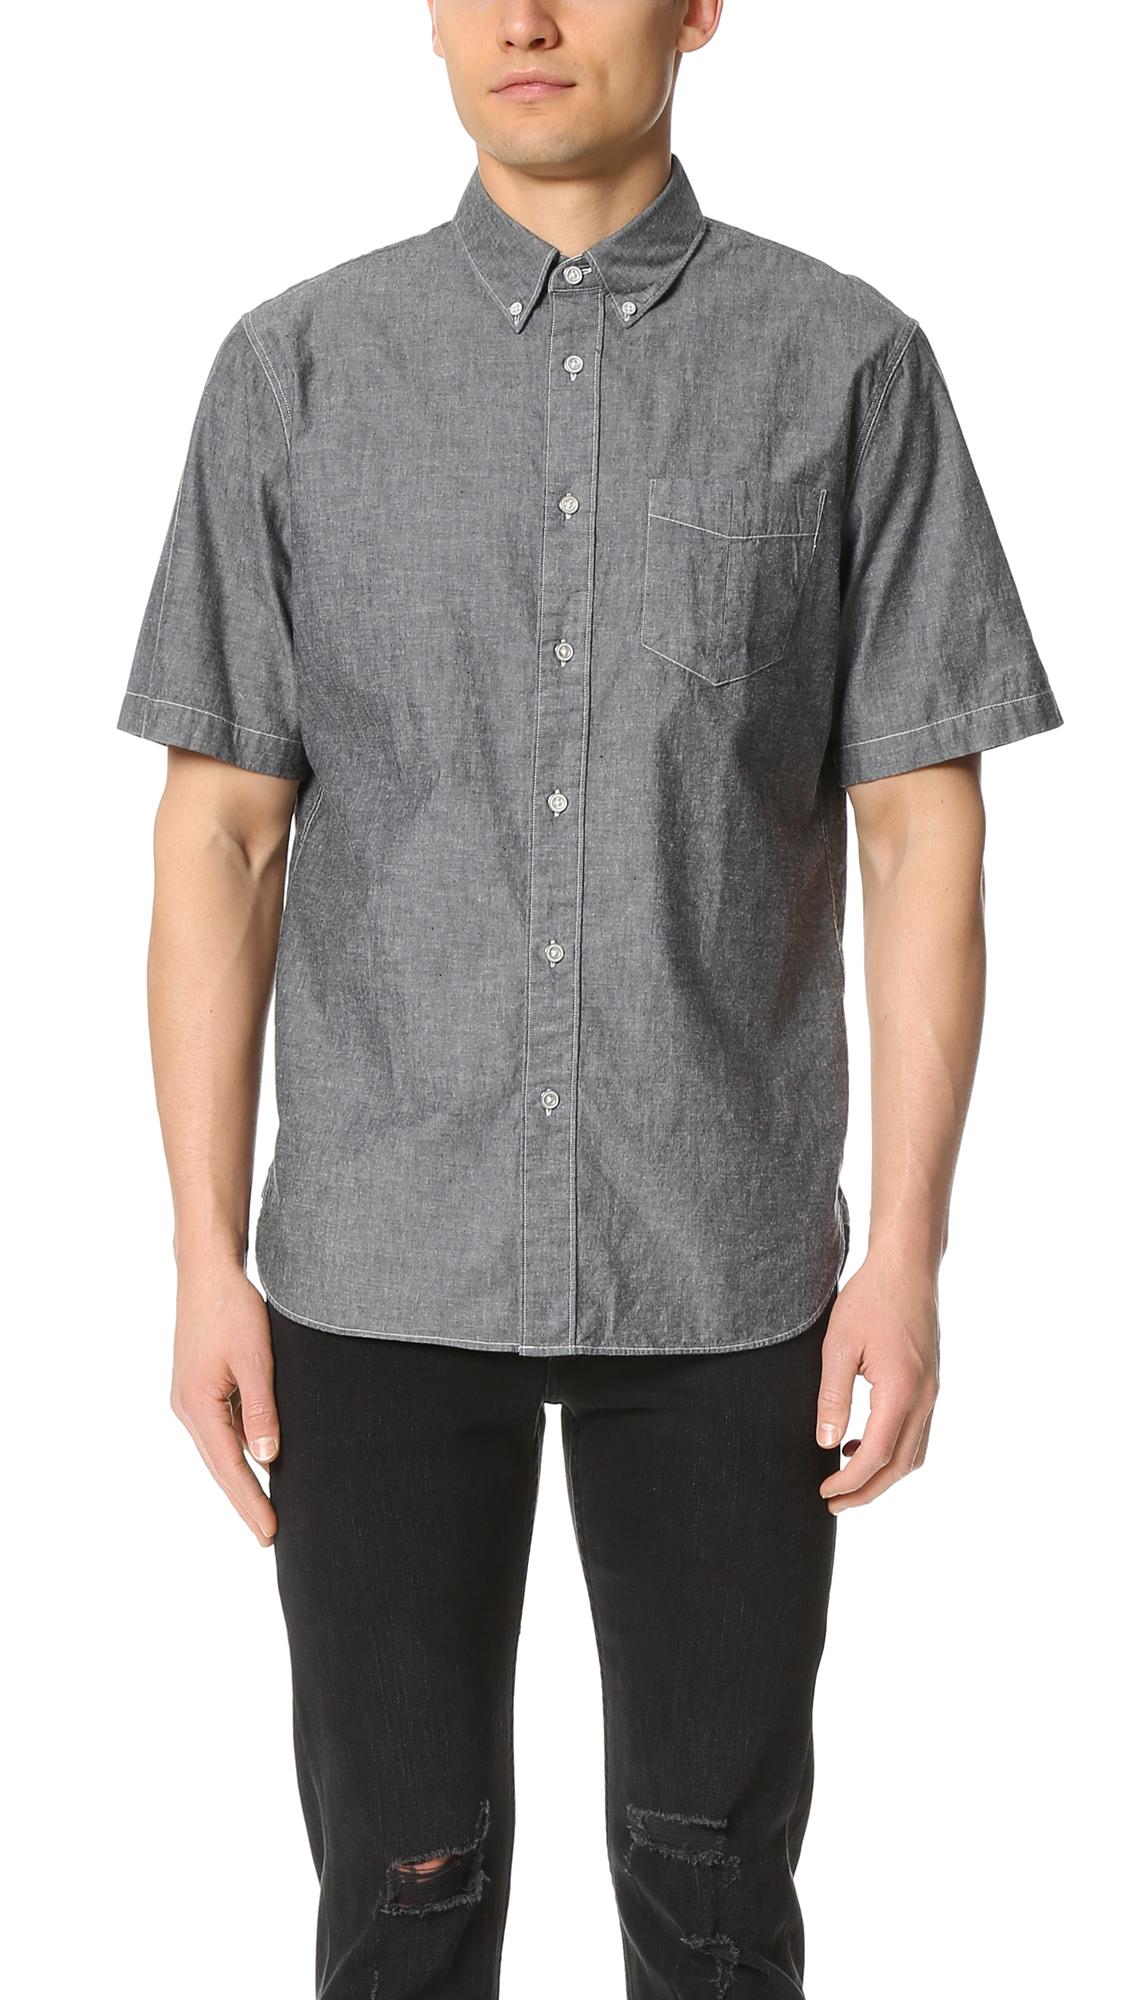 Rag Bone Short Sleeve Standard Issue Chambray Shirt In